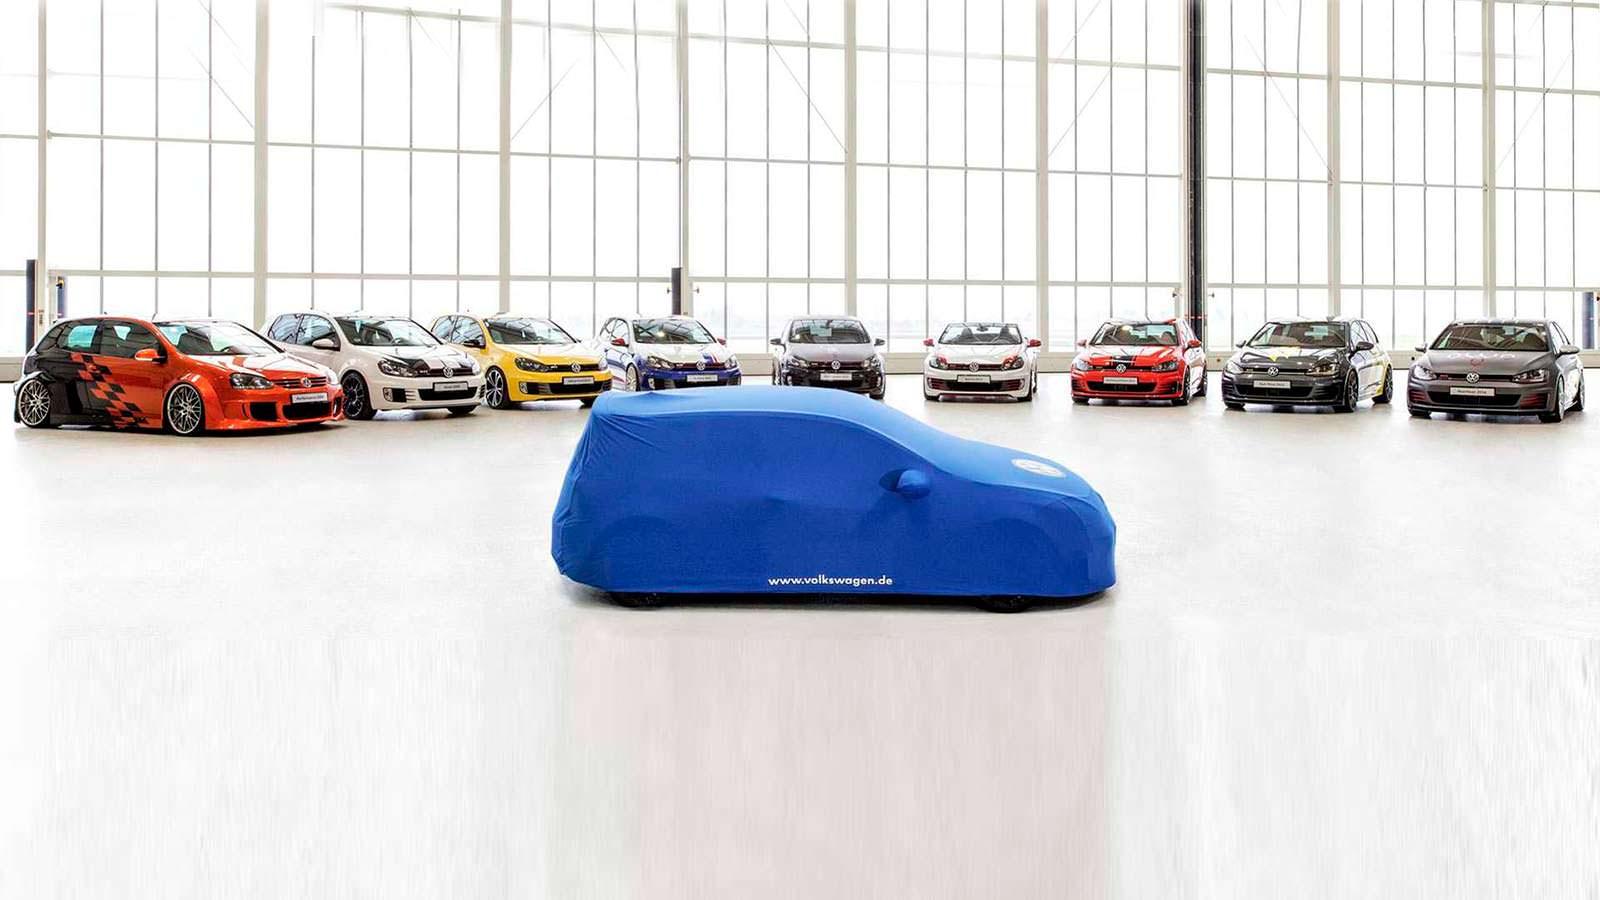 VW обнародовал новый тизер концепта Golf GTI Worthersee